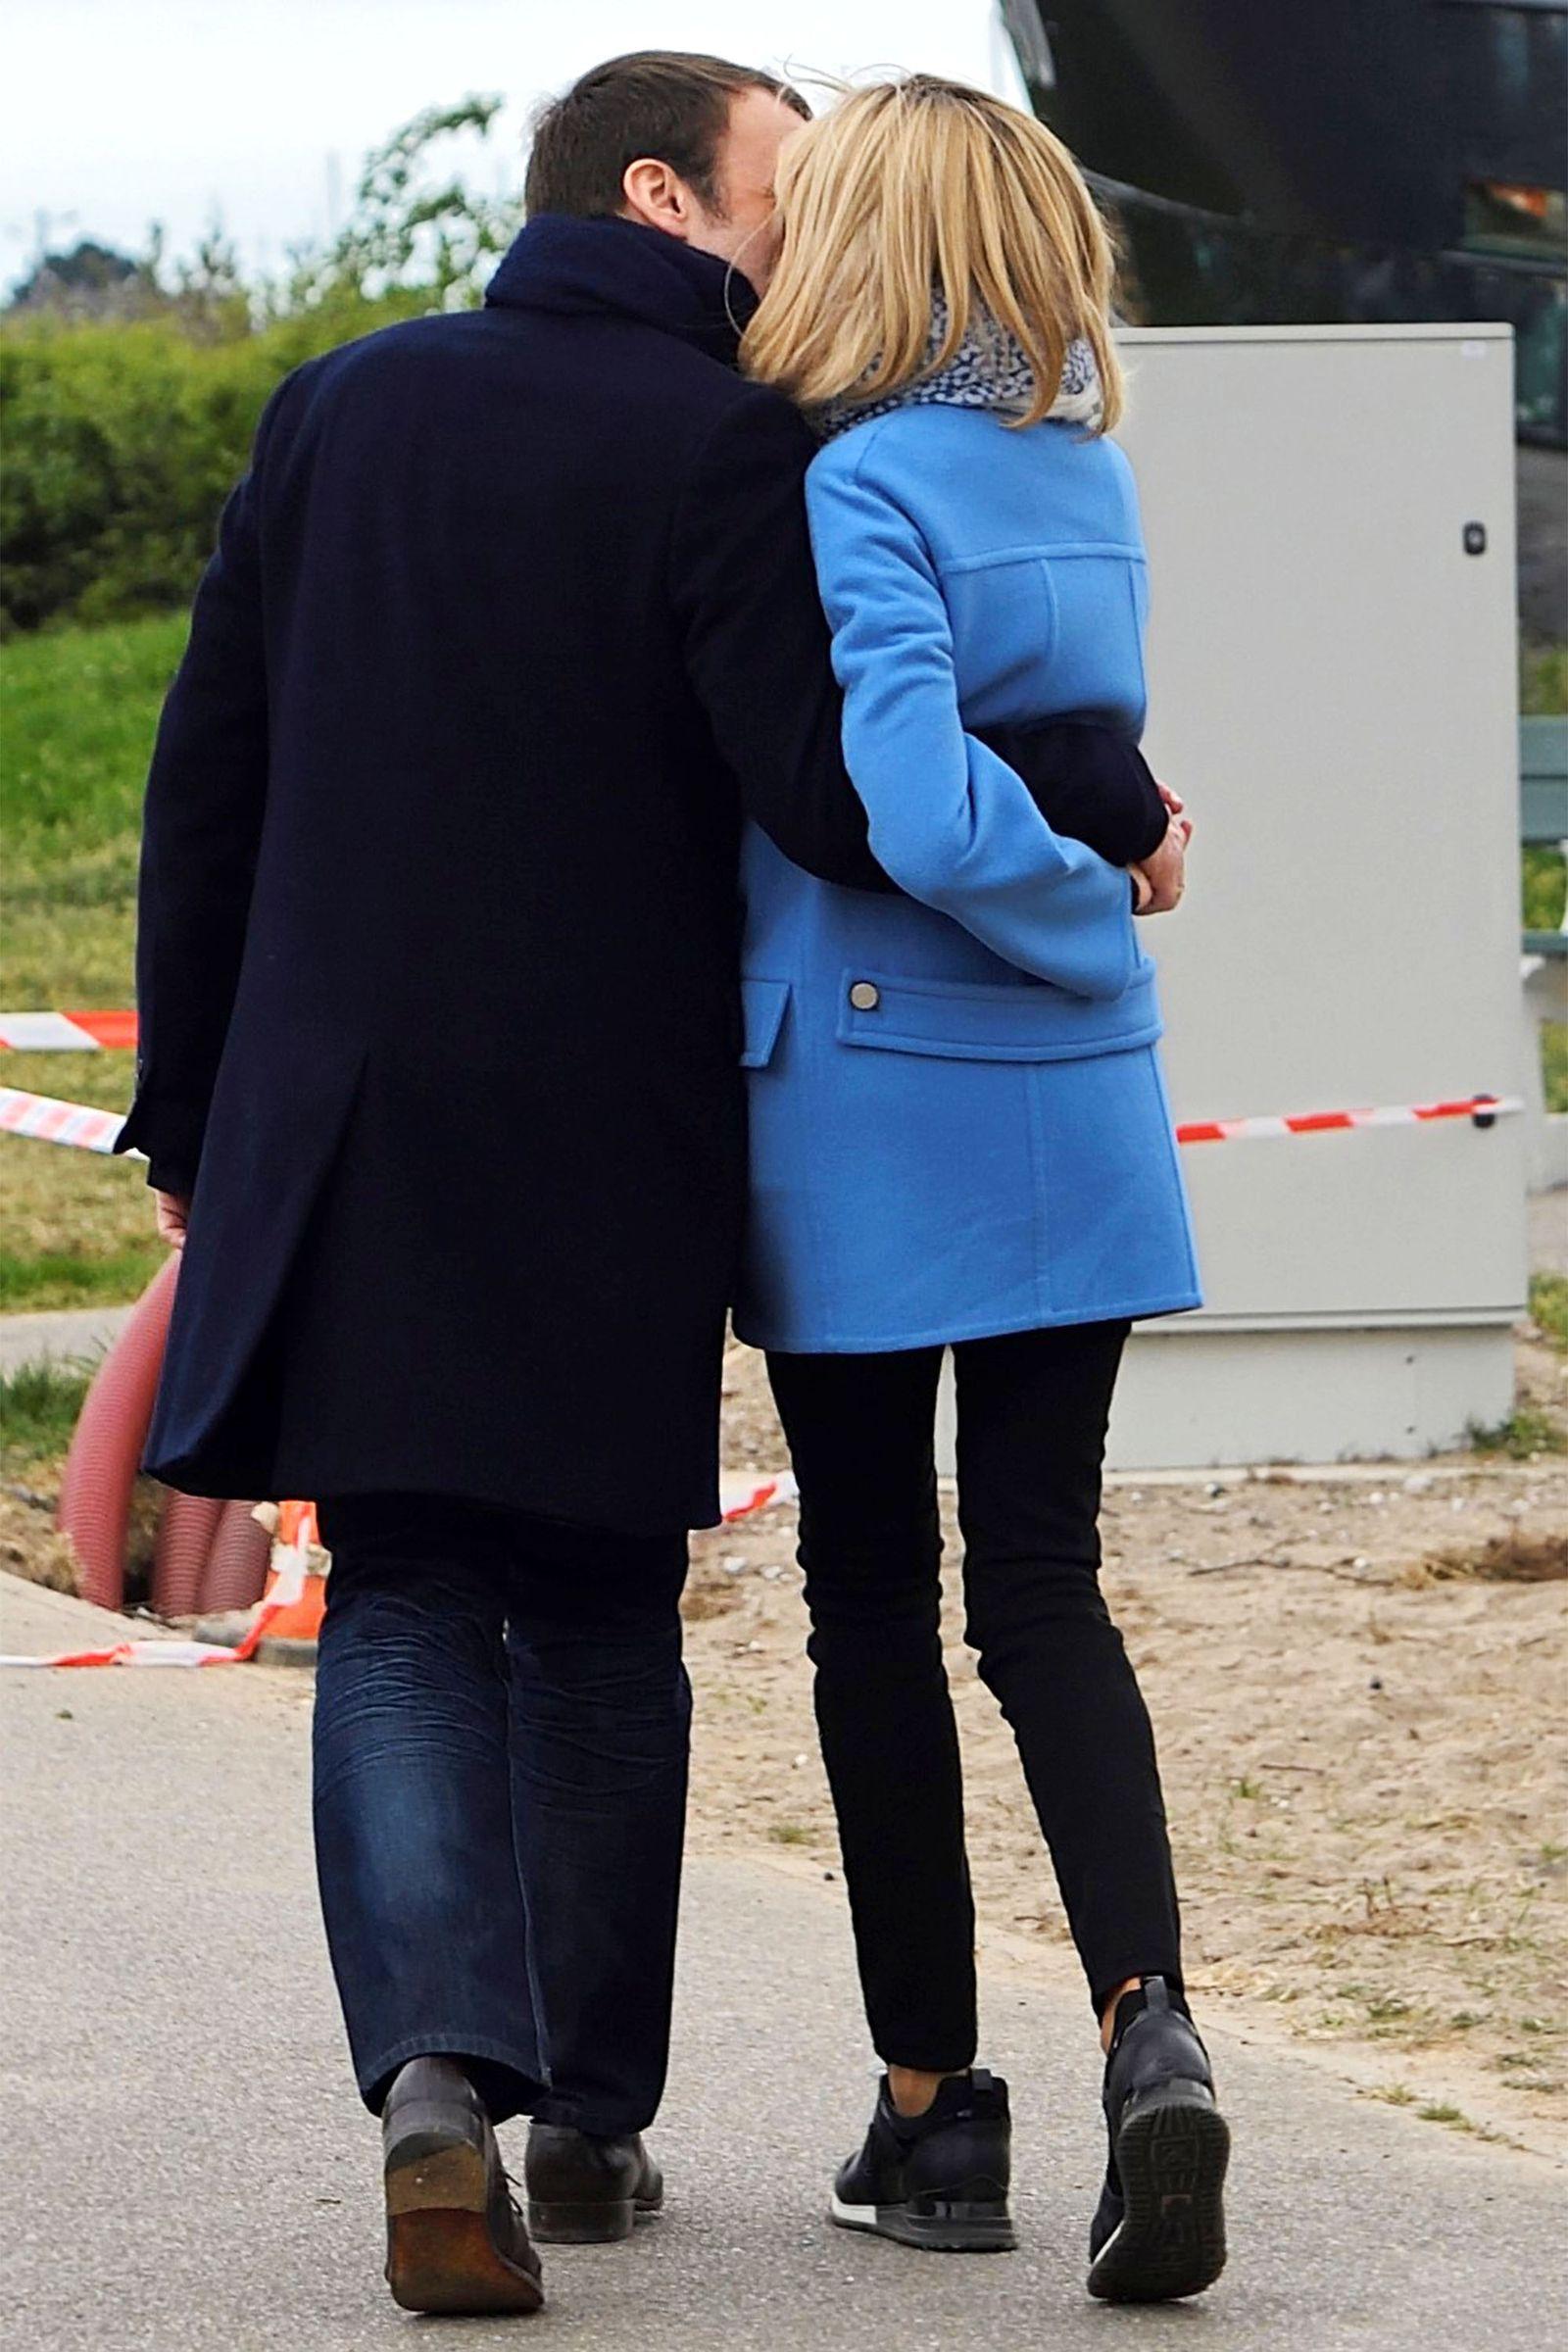 Emmanuel and Brigitte Macron's Sweetest Moments in 2020